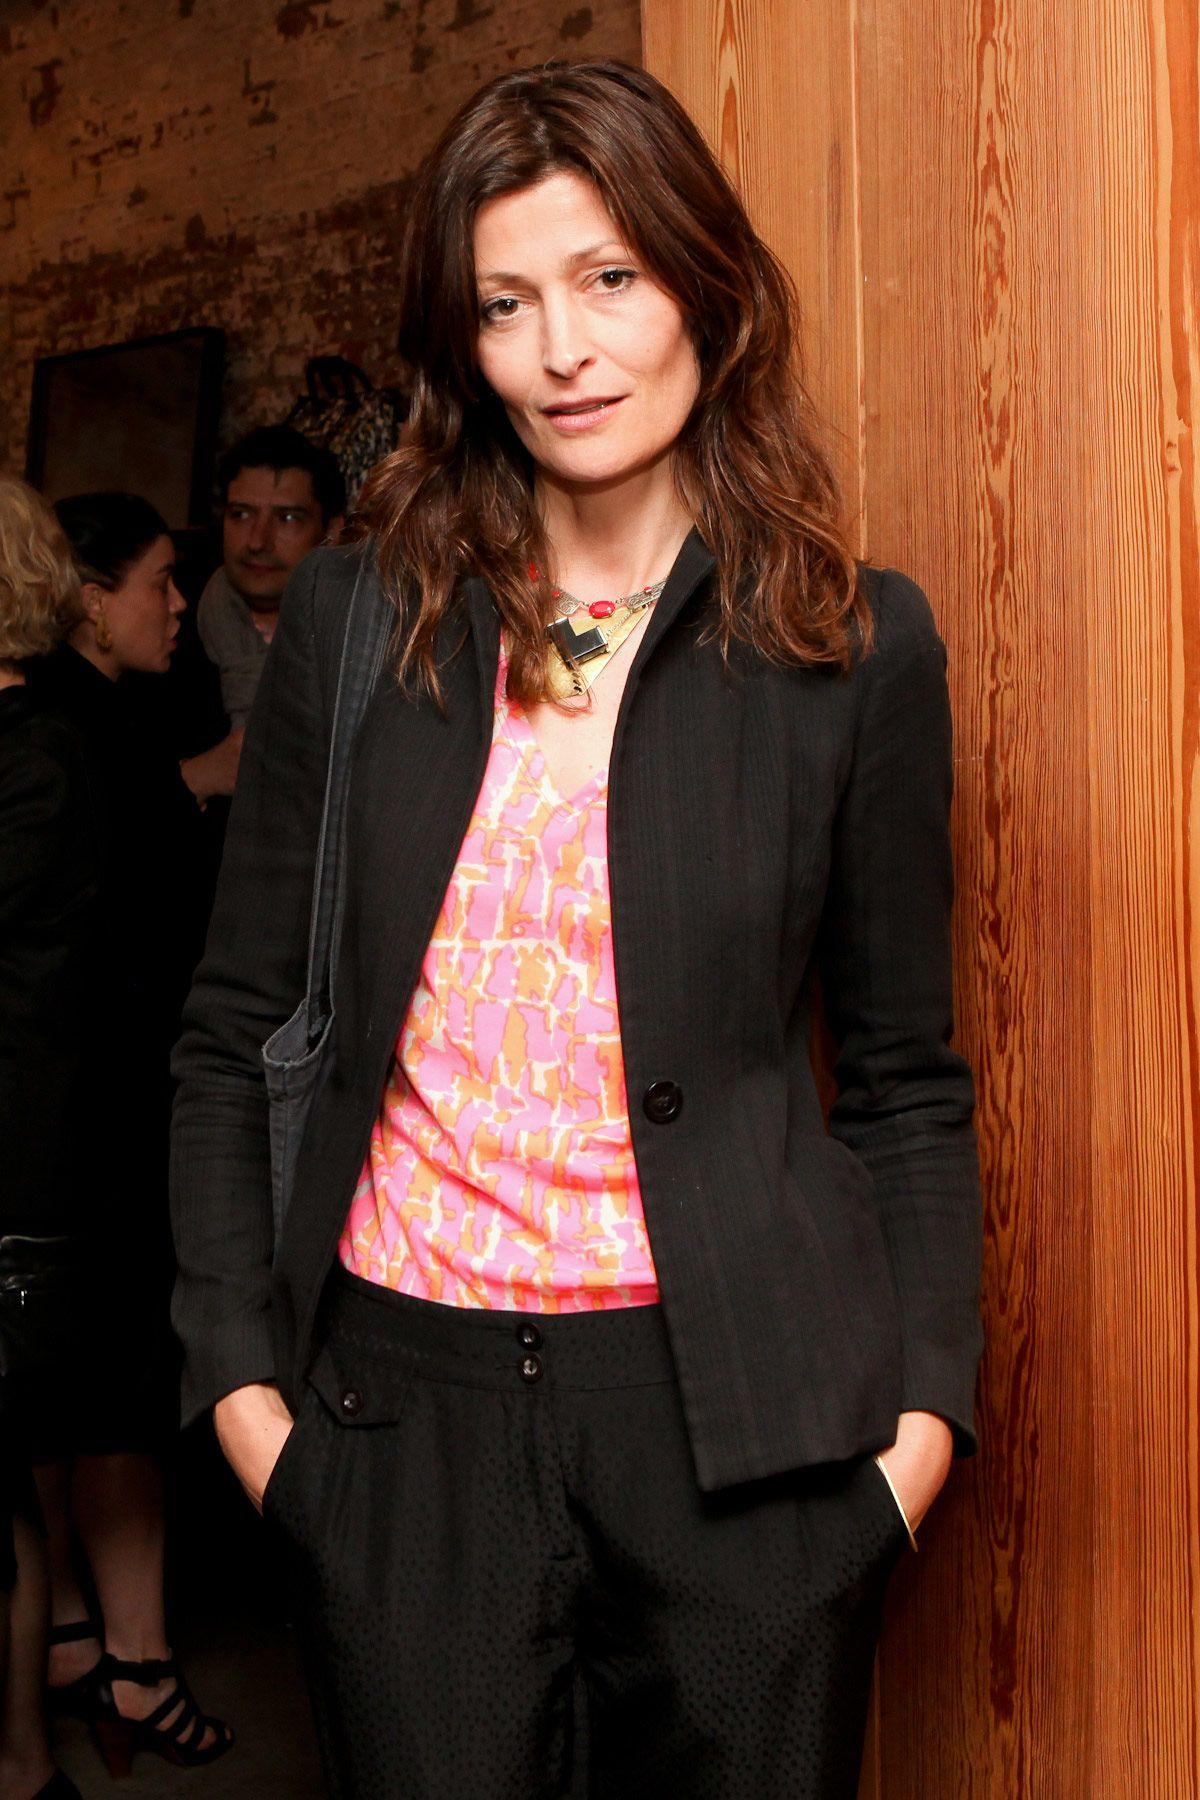 Events - 92Y, New York Jane mayle fashion designer